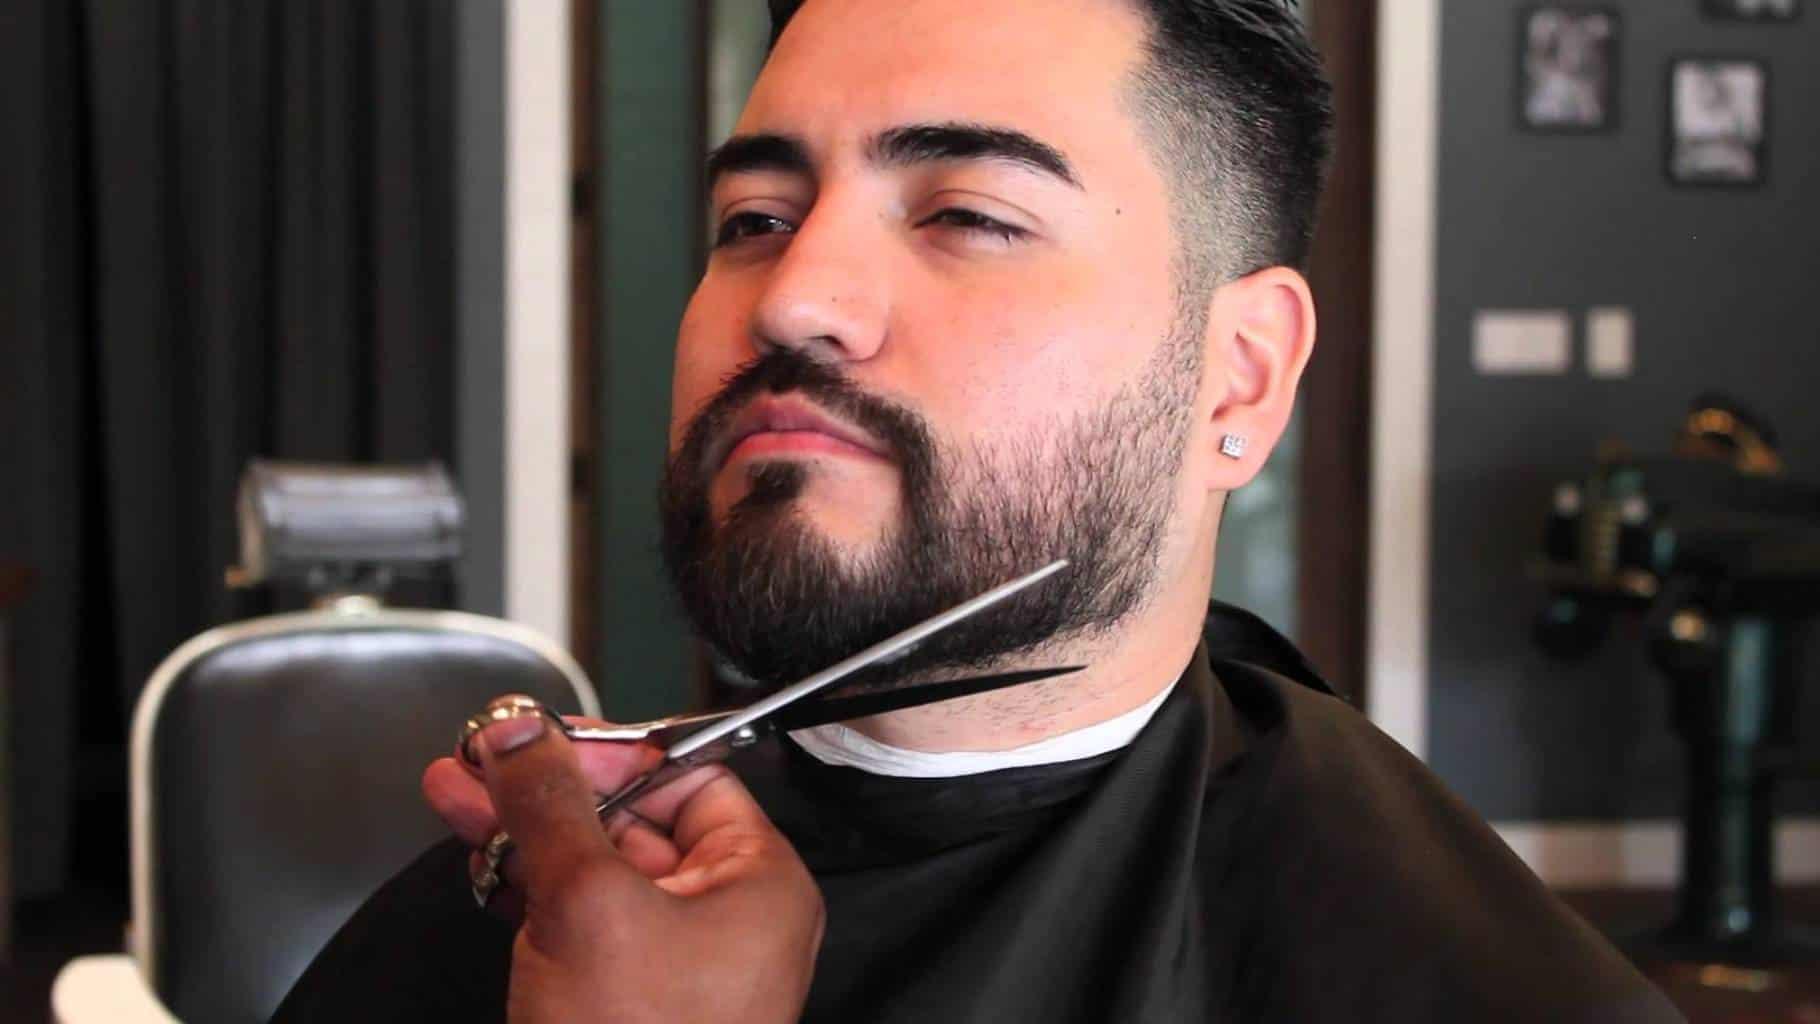 maxresdefault How to Make Your Beard Soft & Shiny: 11 Expert Tips